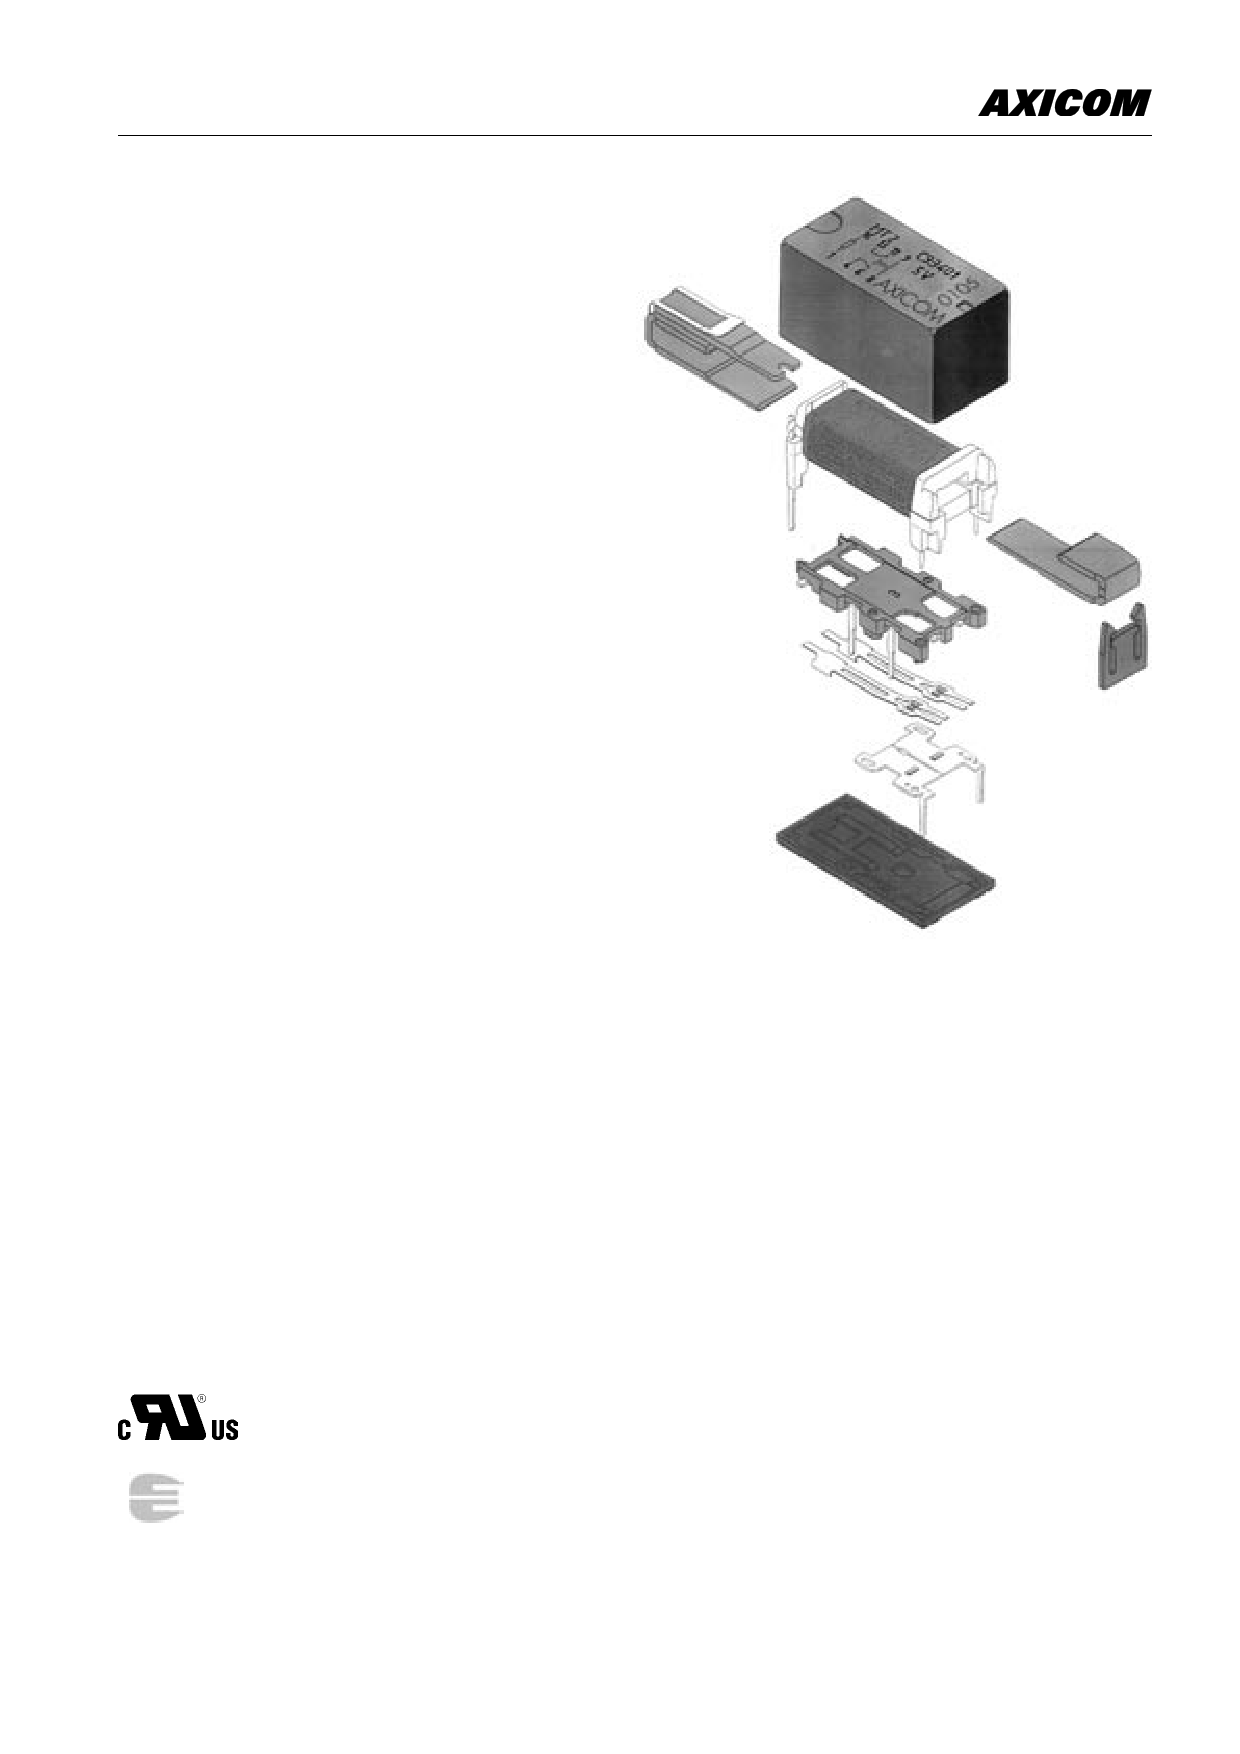 7-1462000-0 Даташит, Описание, Даташиты